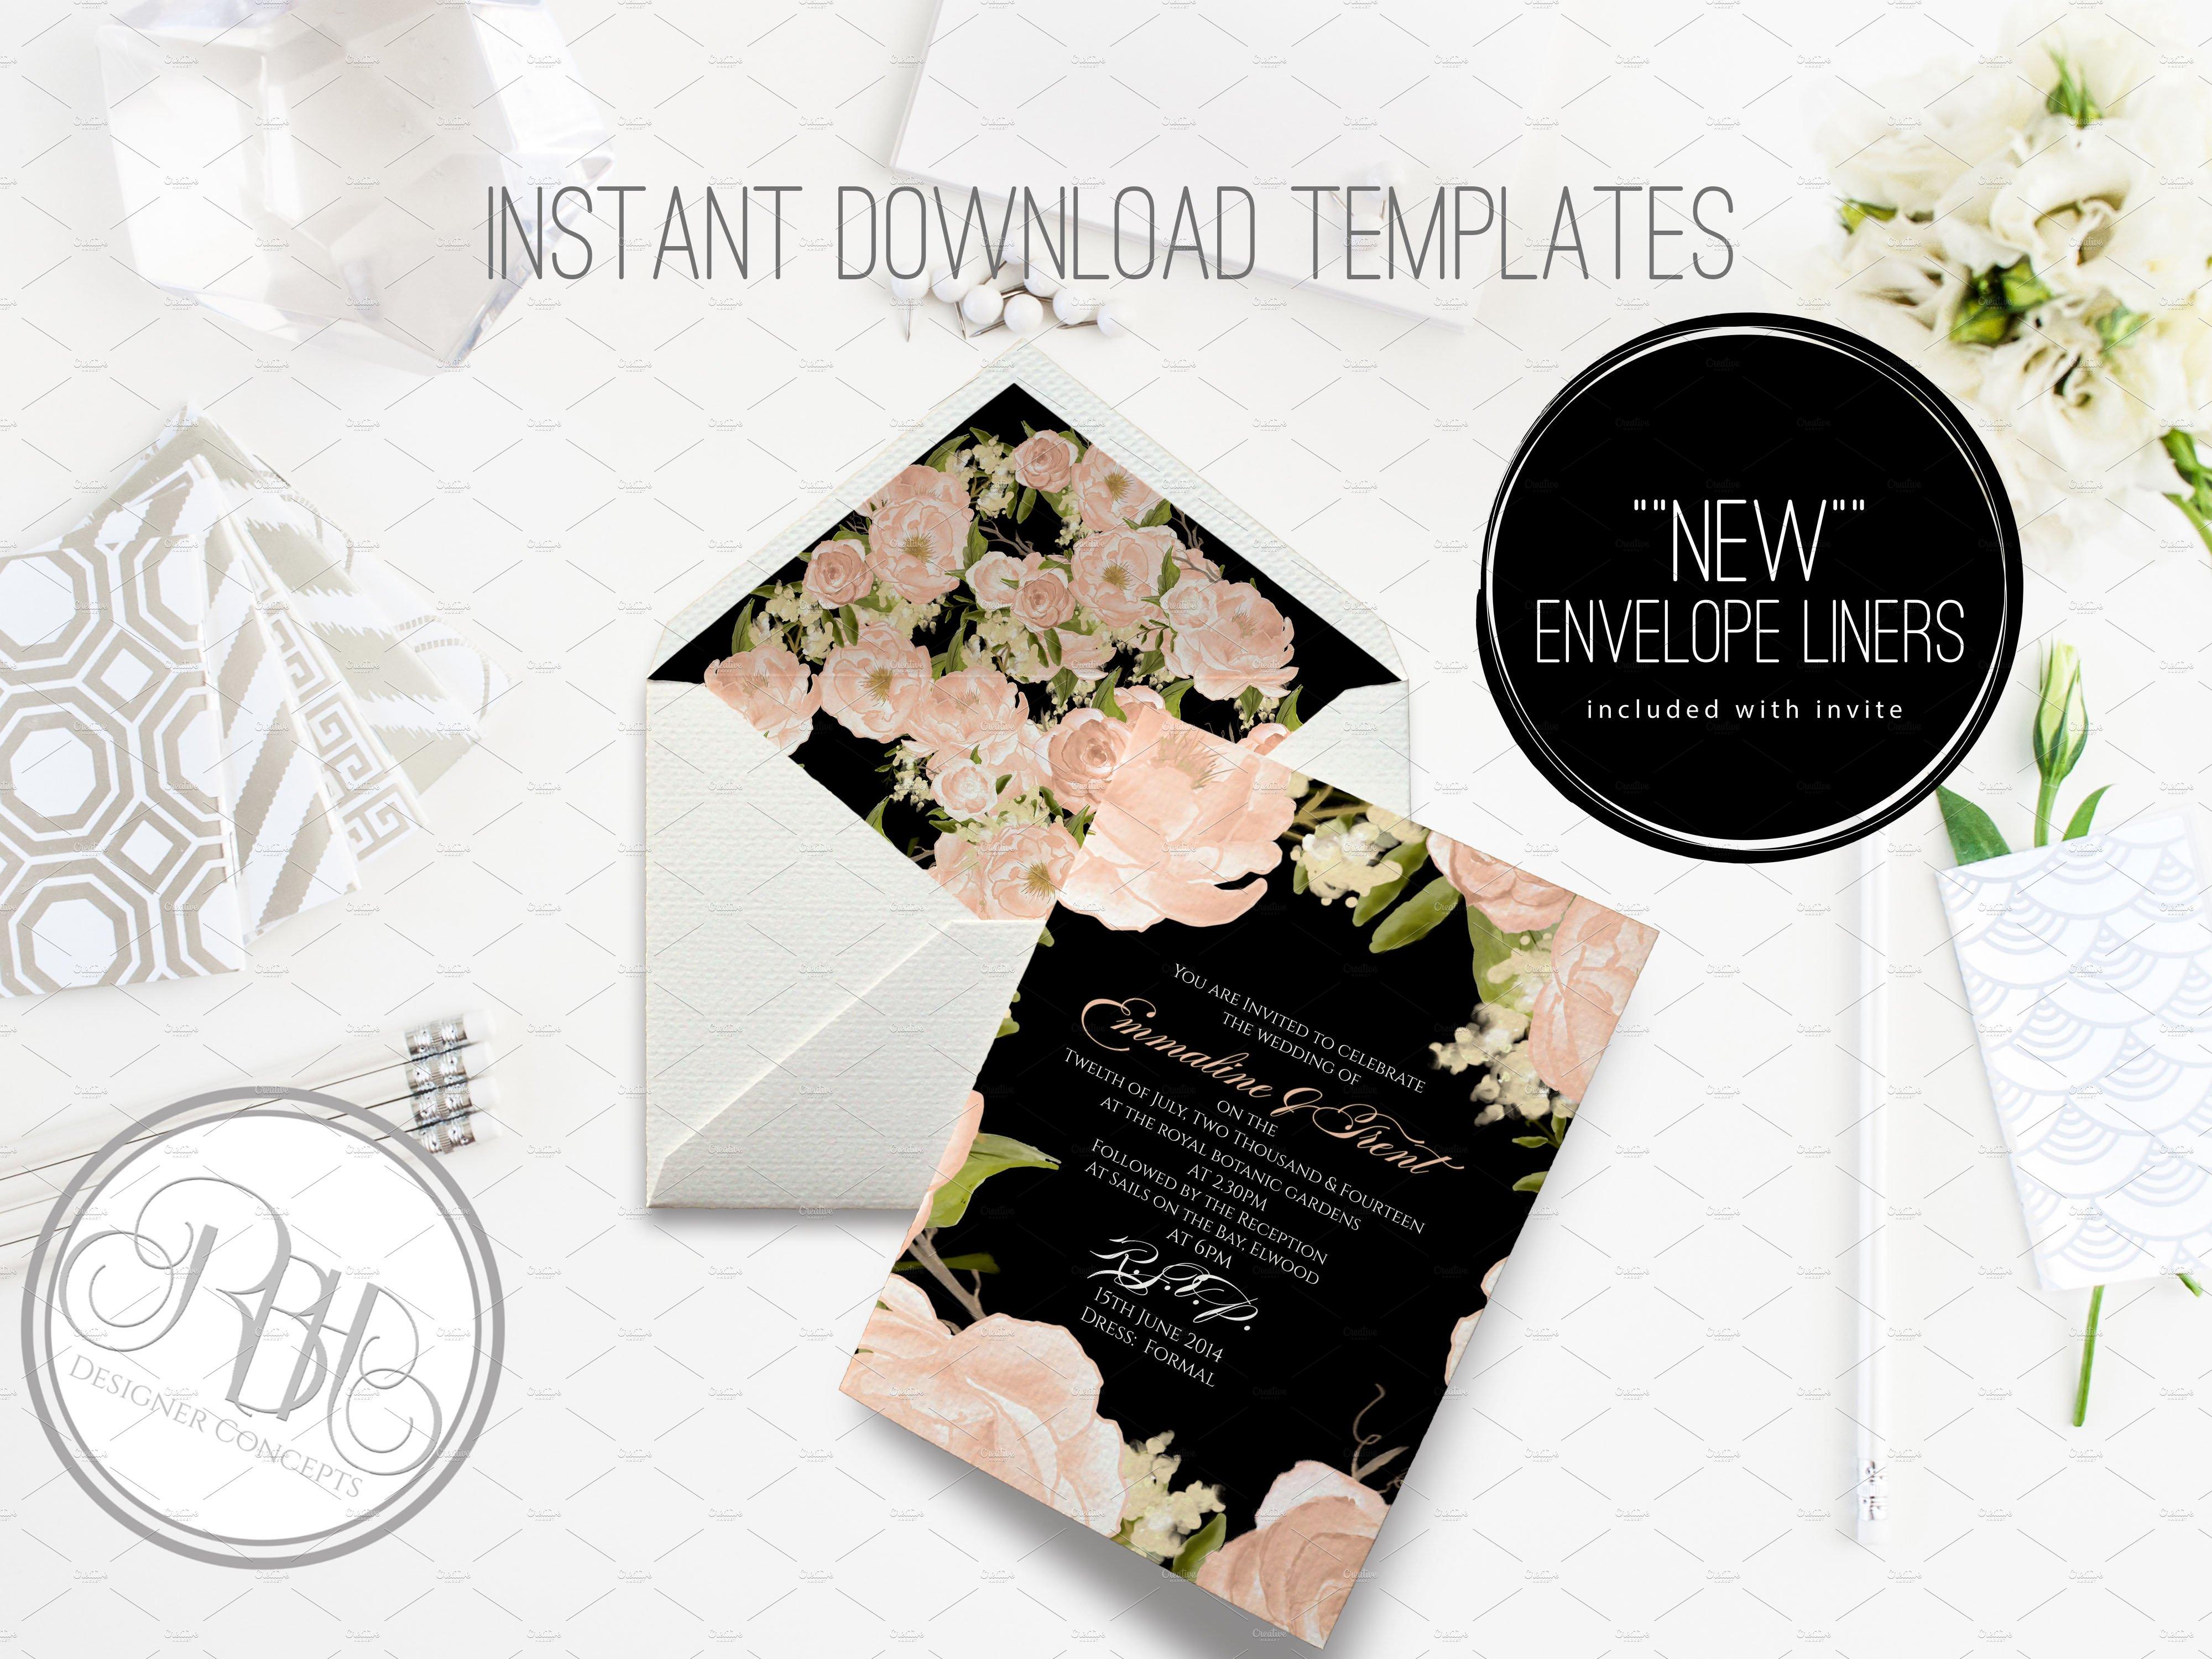 Peach peonies wedding invite invitation templates creative market pronofoot35fo Images